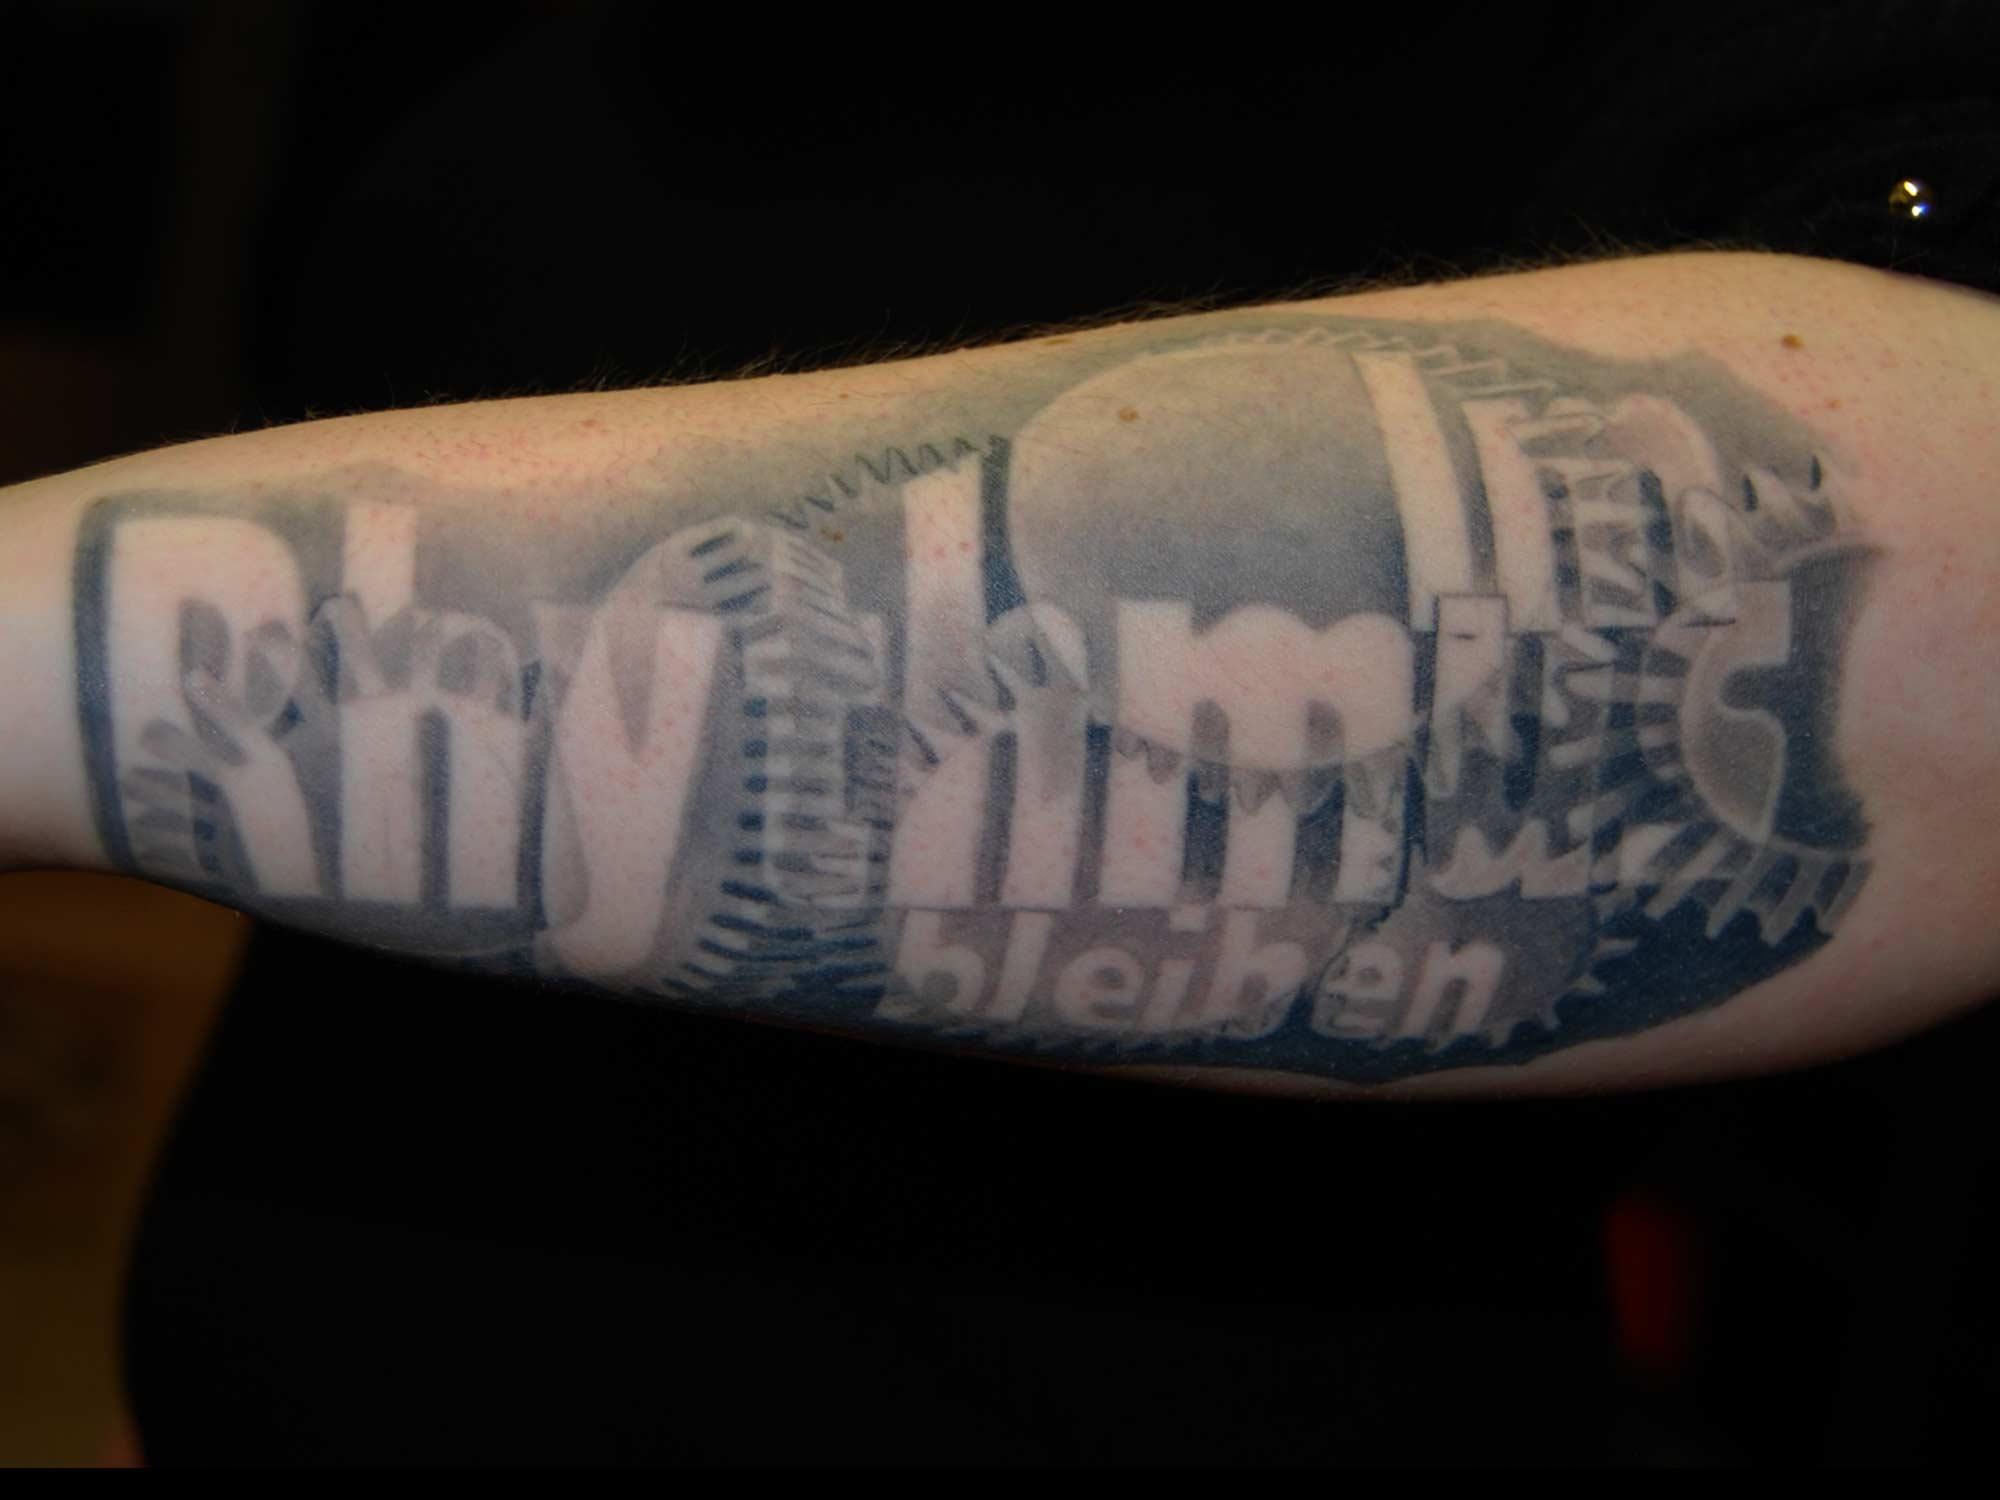 biomechanik zahnrad tattoo mit schrift hits for life tattoo m nchen. Black Bedroom Furniture Sets. Home Design Ideas